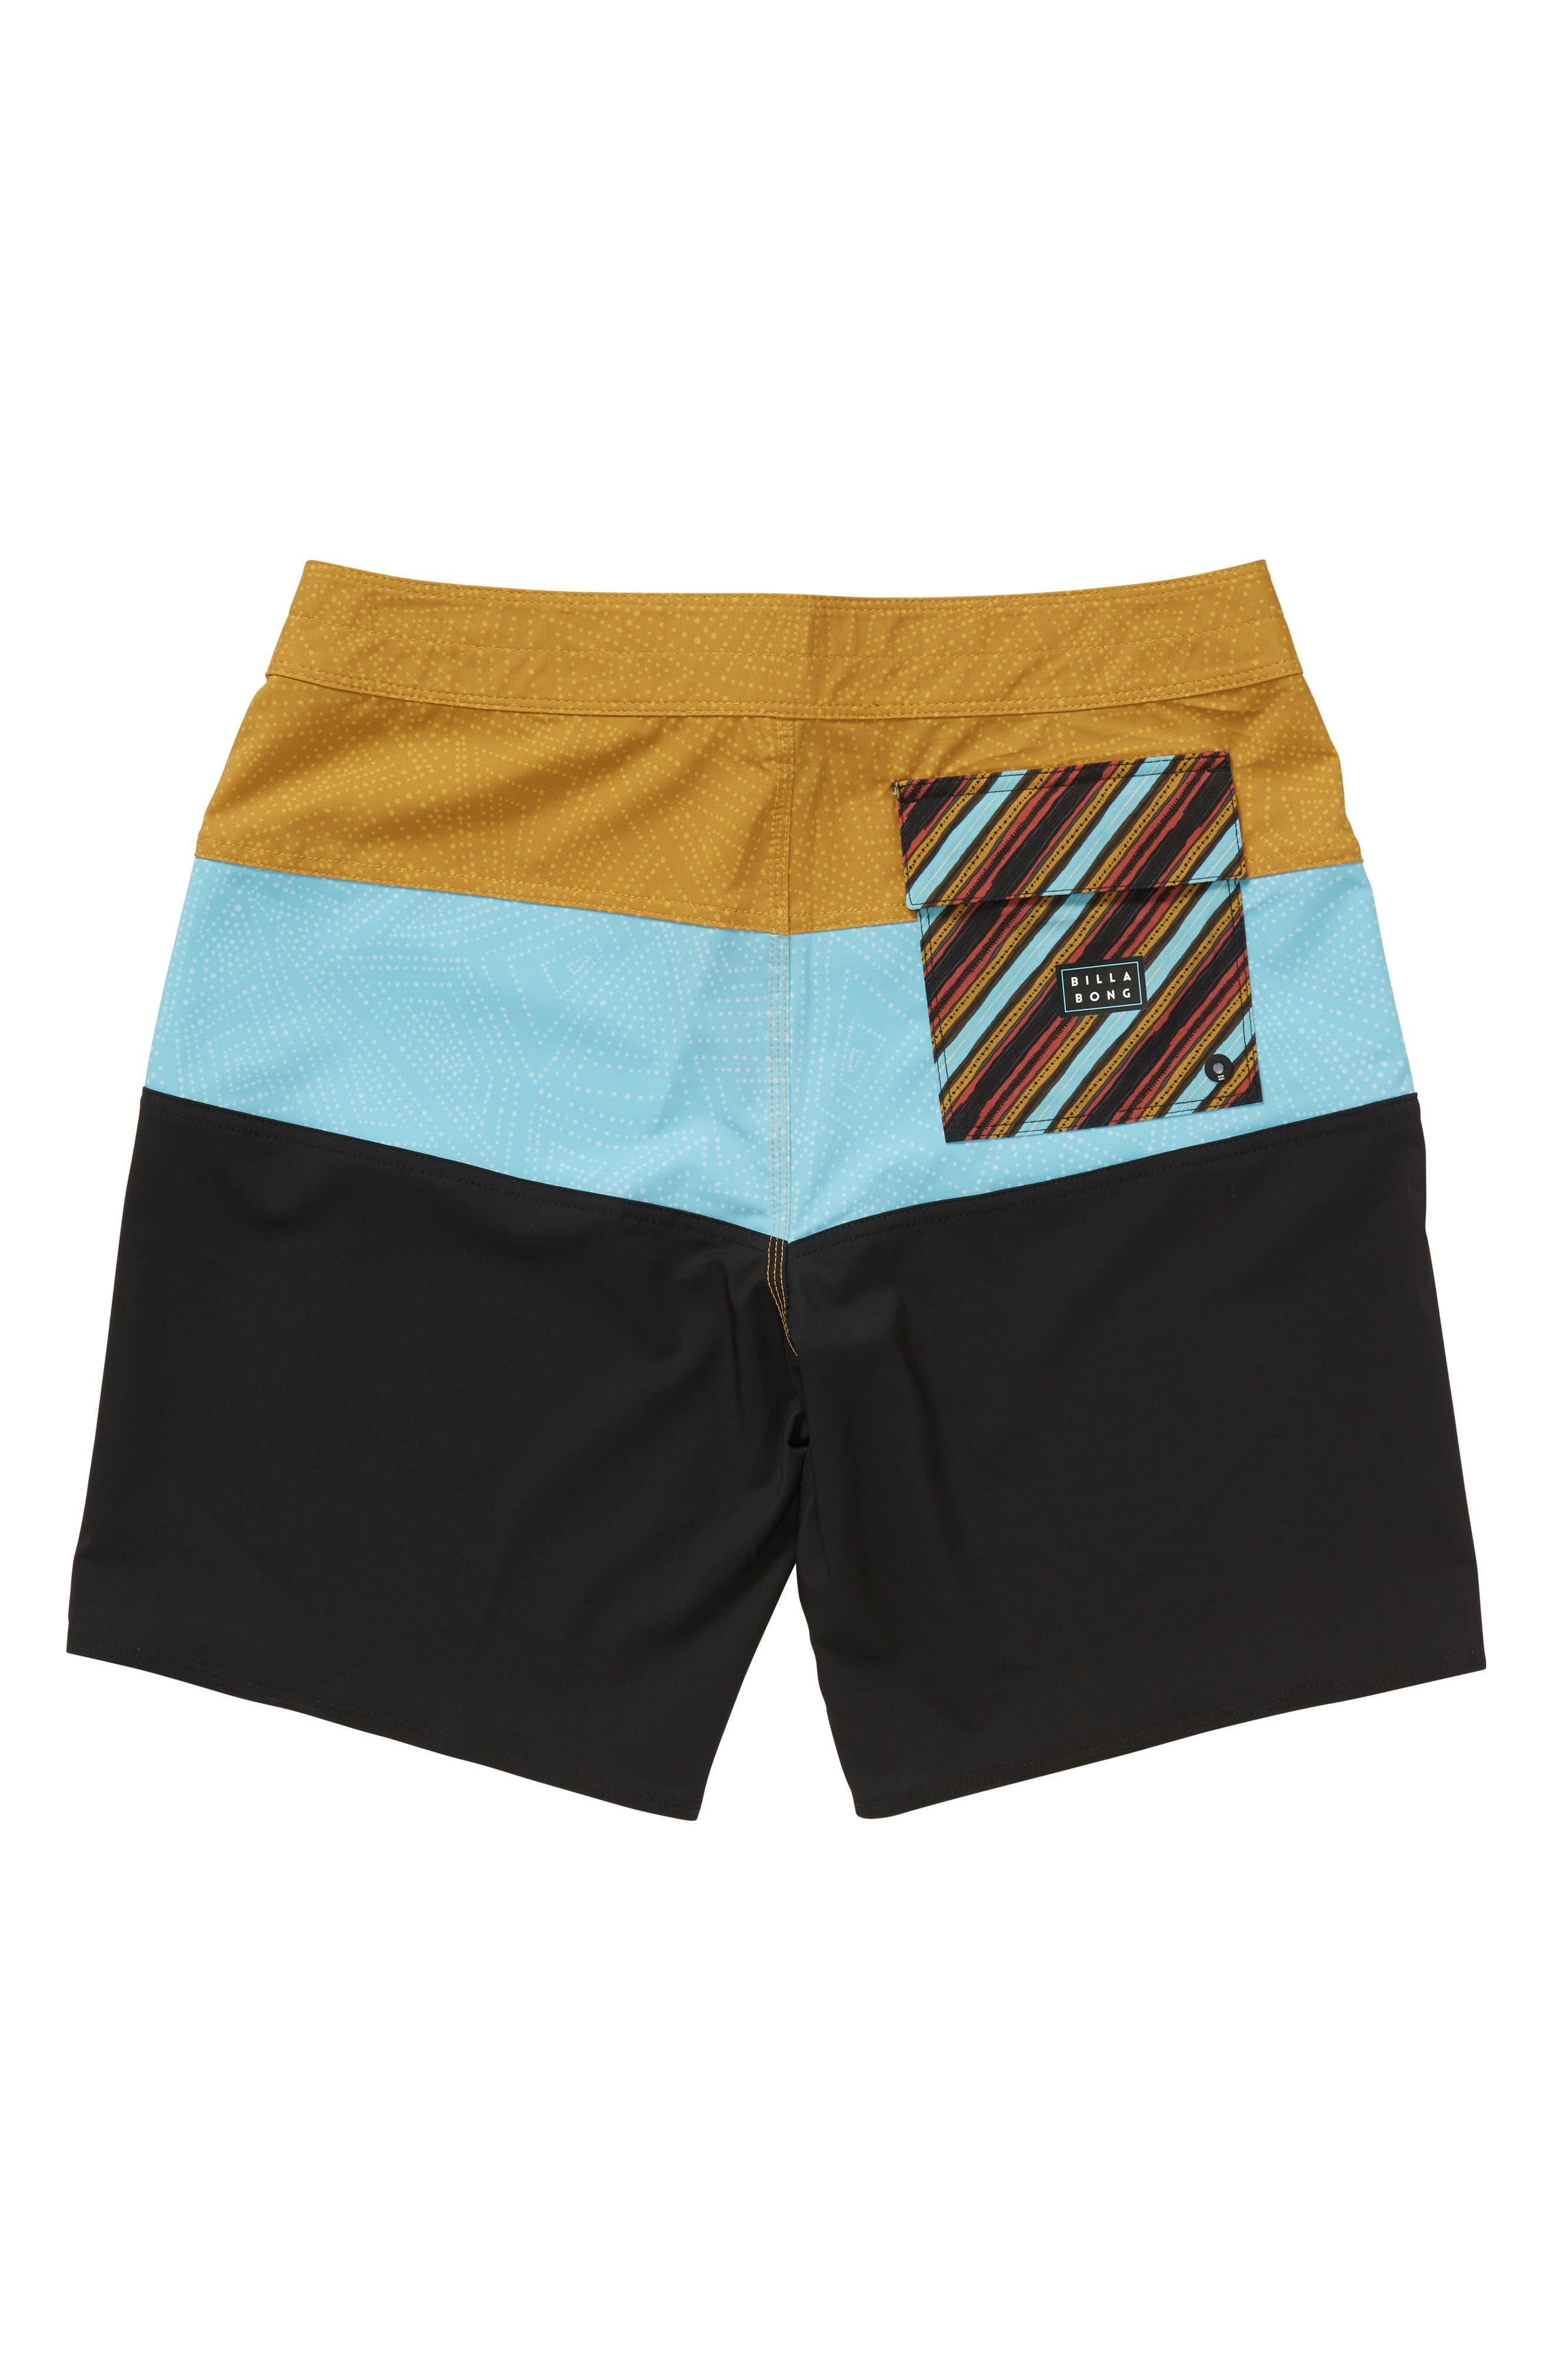 Tribong X Board Shorts,                             Alternate thumbnail 2, color,                             Aqua